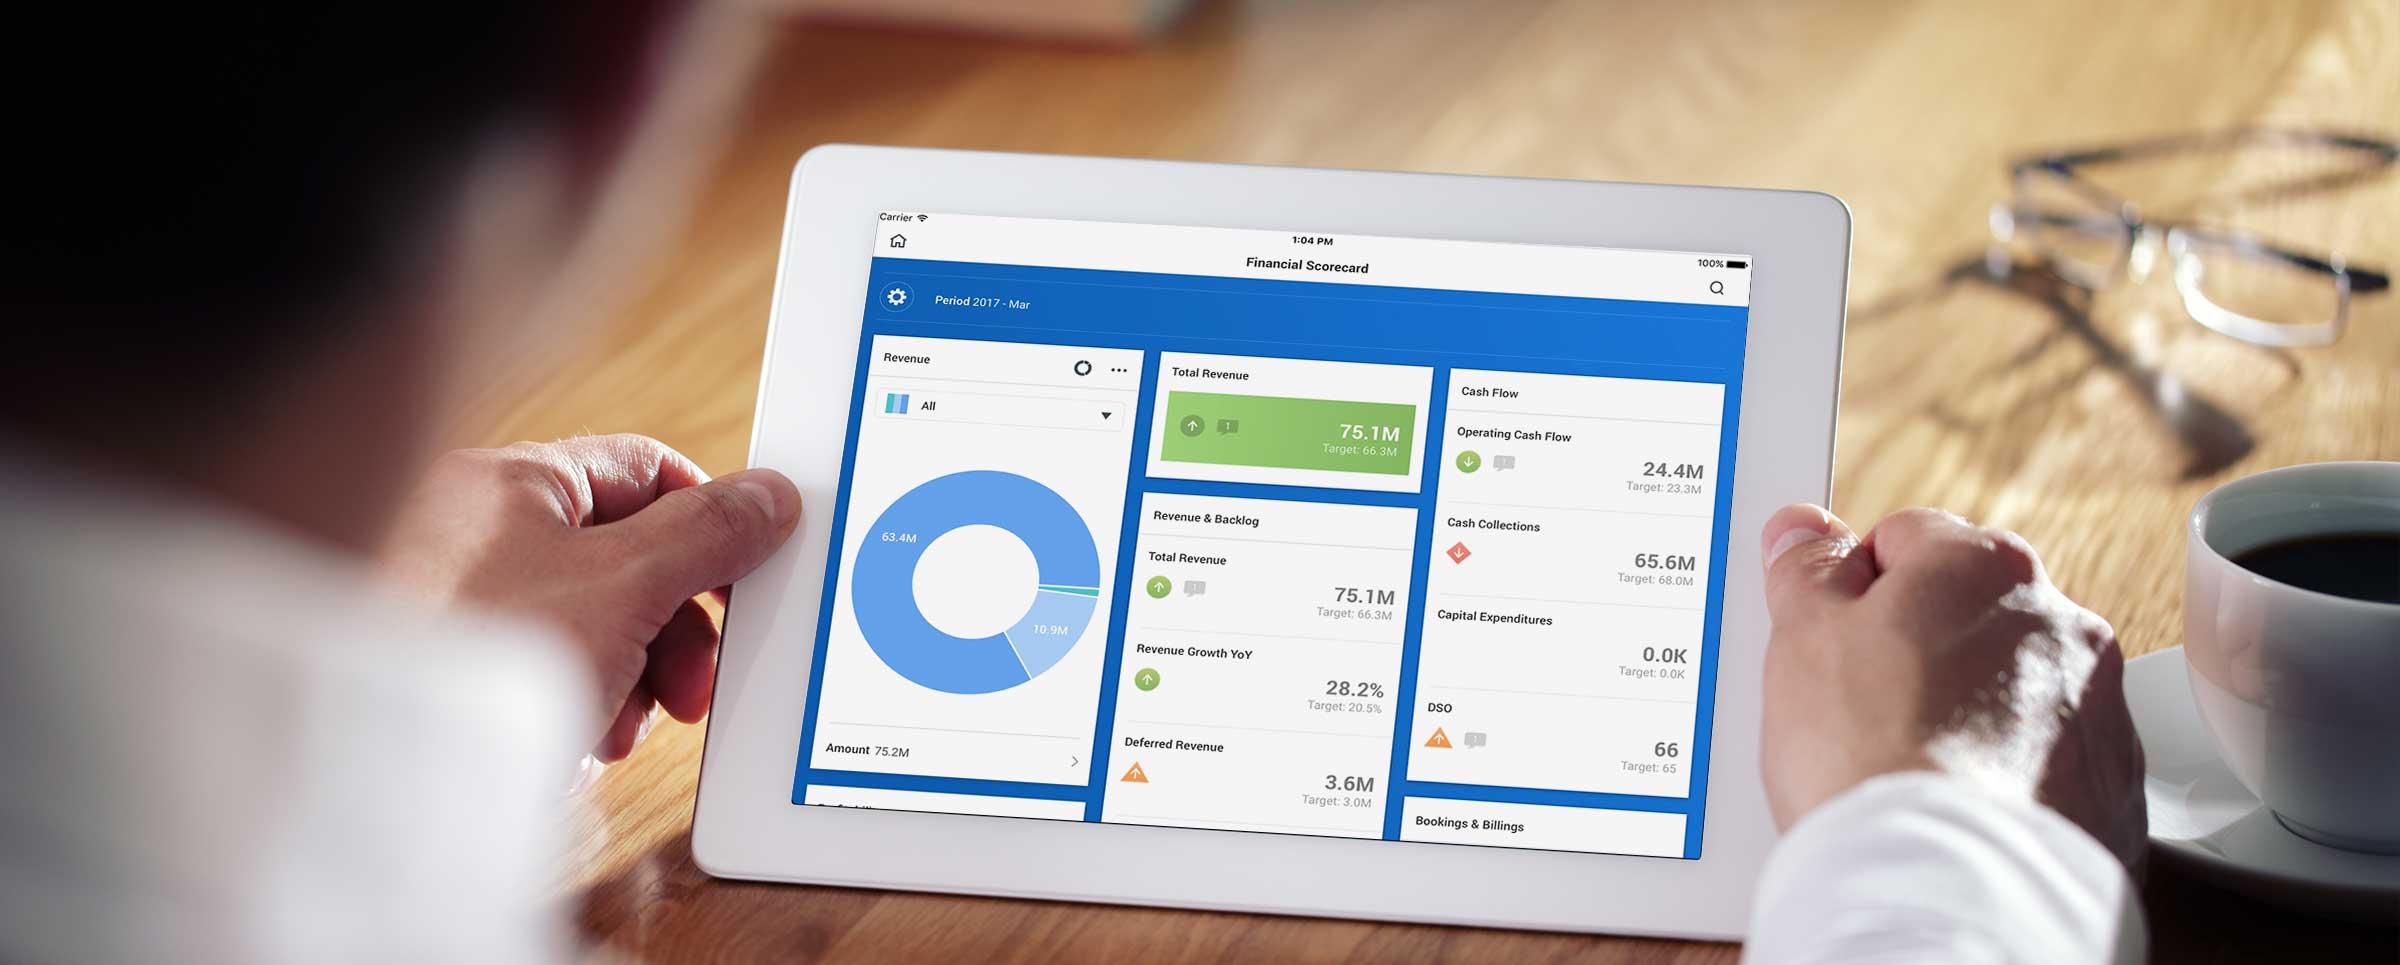 Cloud ERP | Enterprise Resource Planning Software | Workday